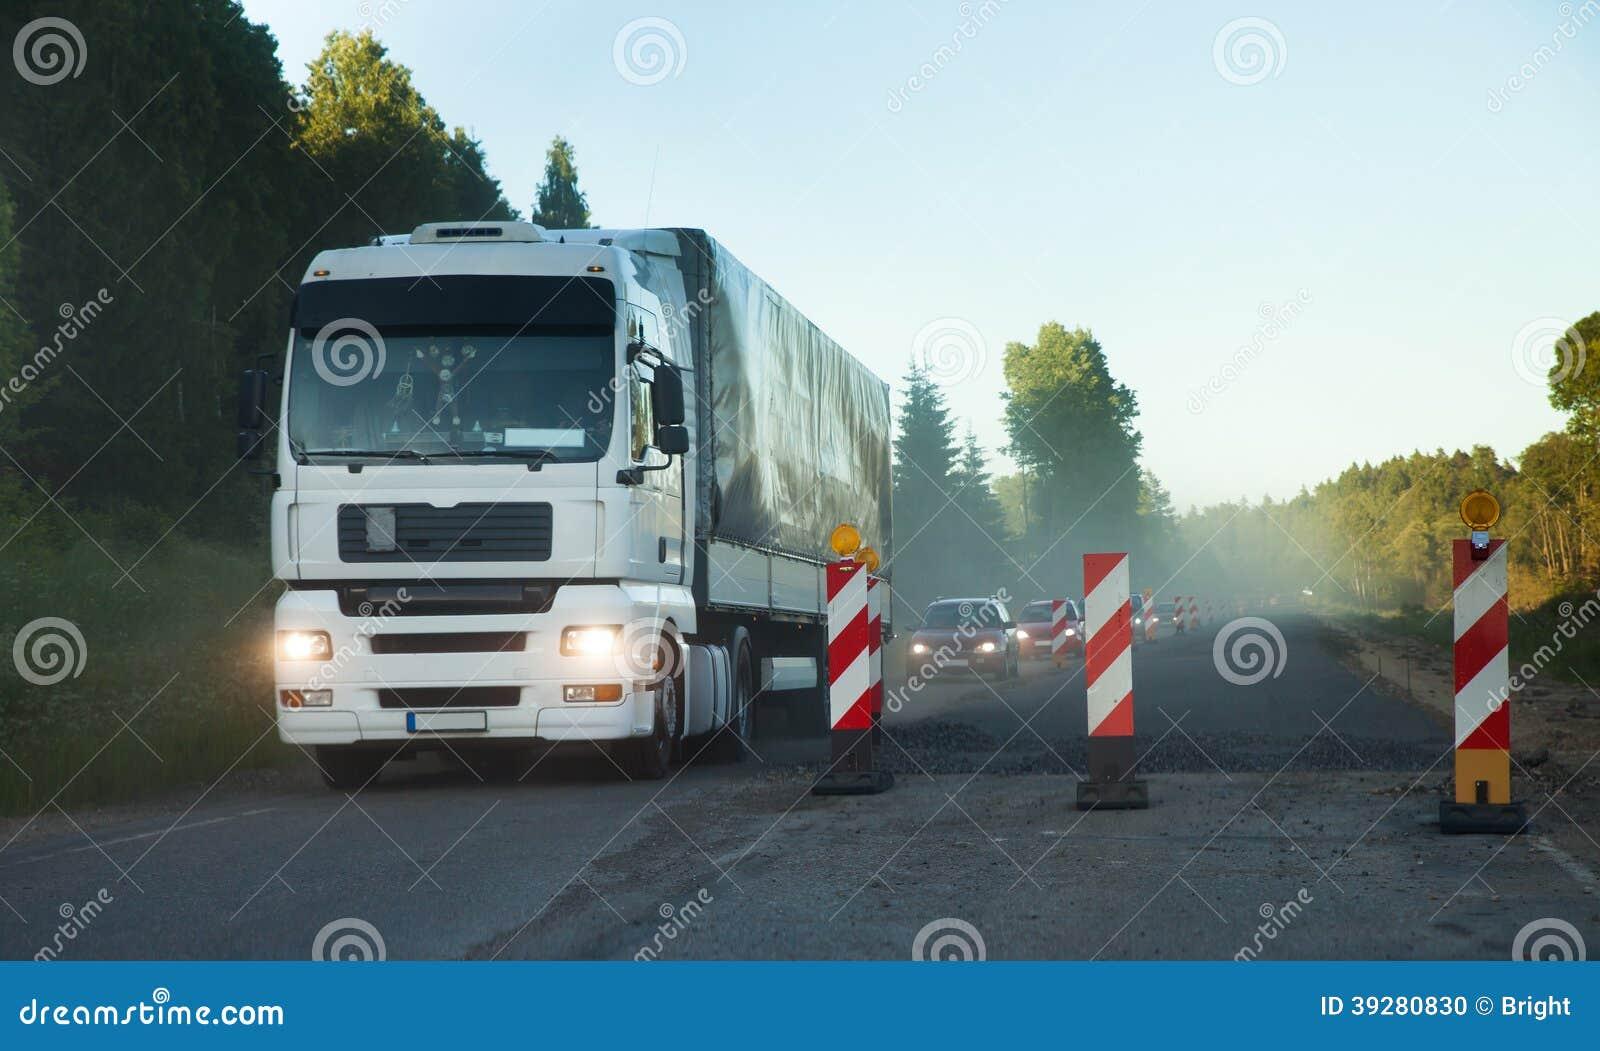 Road Construction, traffic